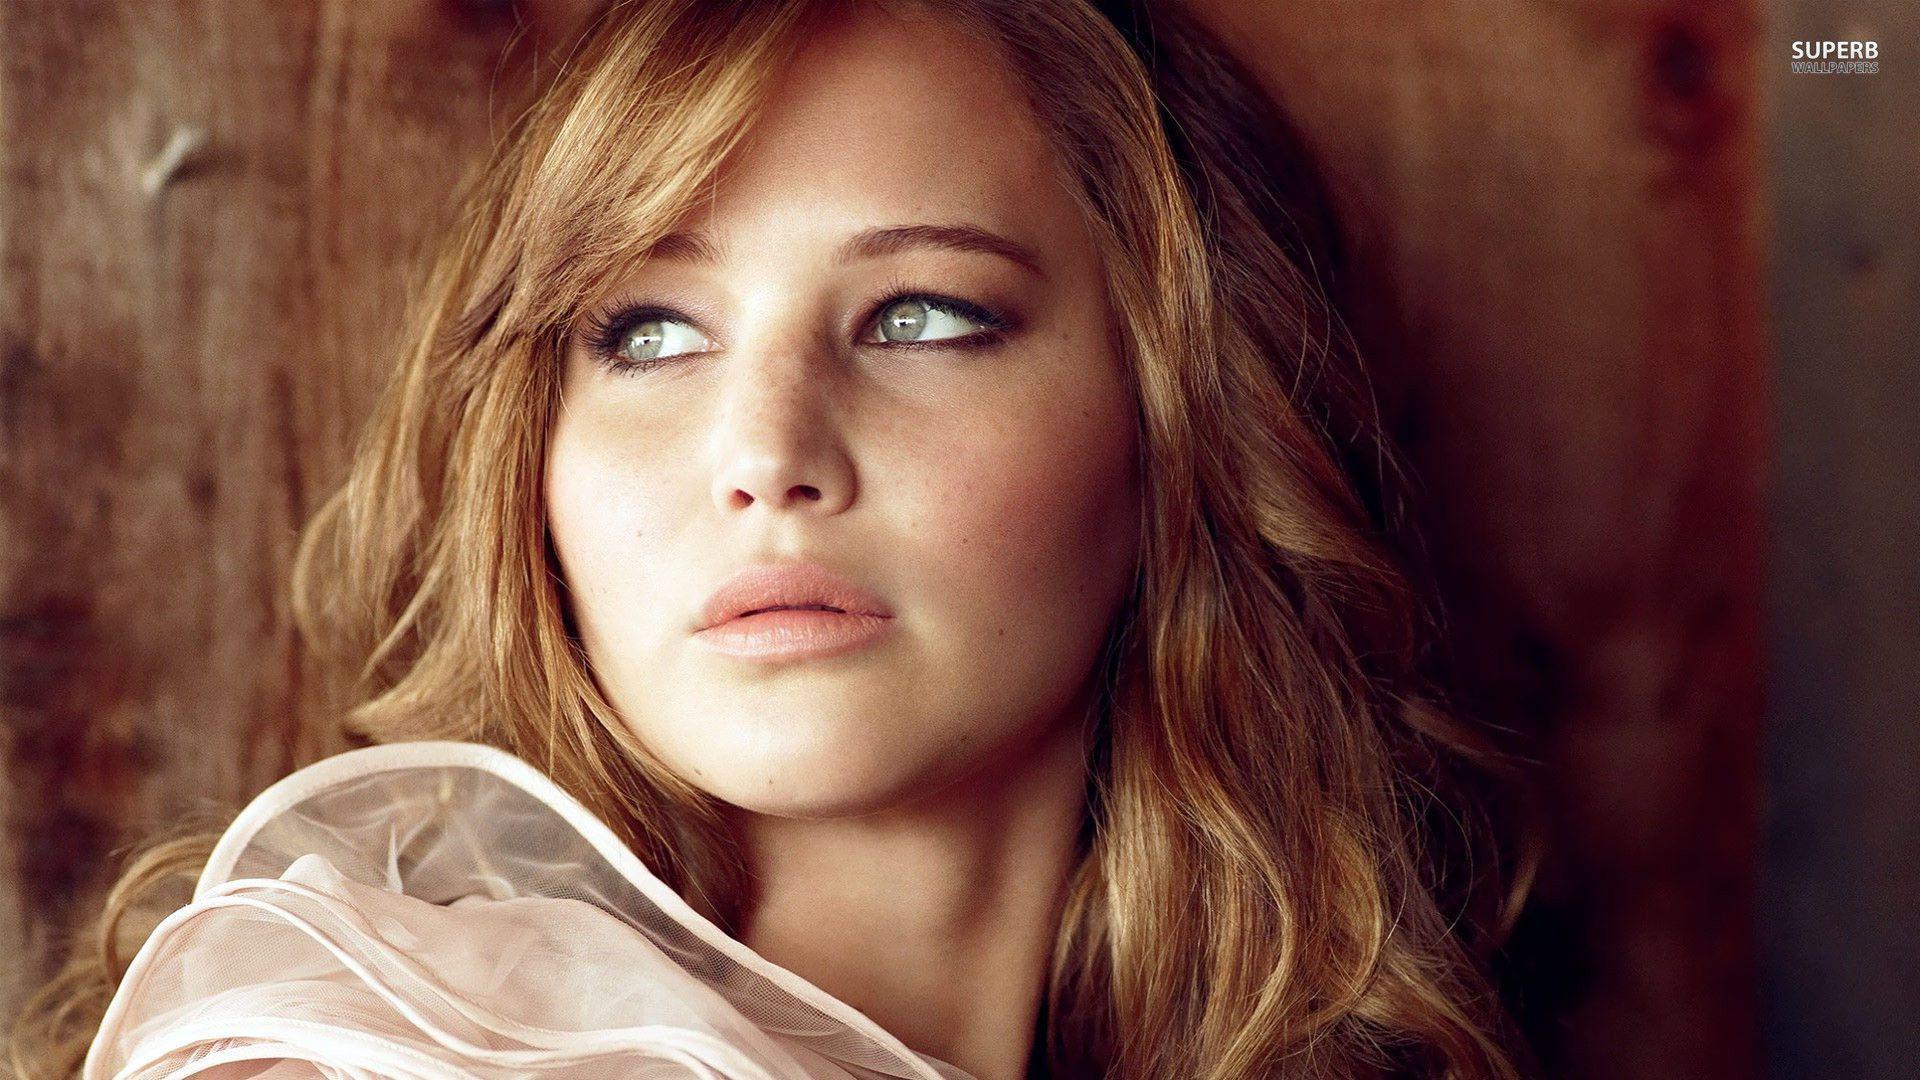 Jennifer Lawrence wallpapers - page 2